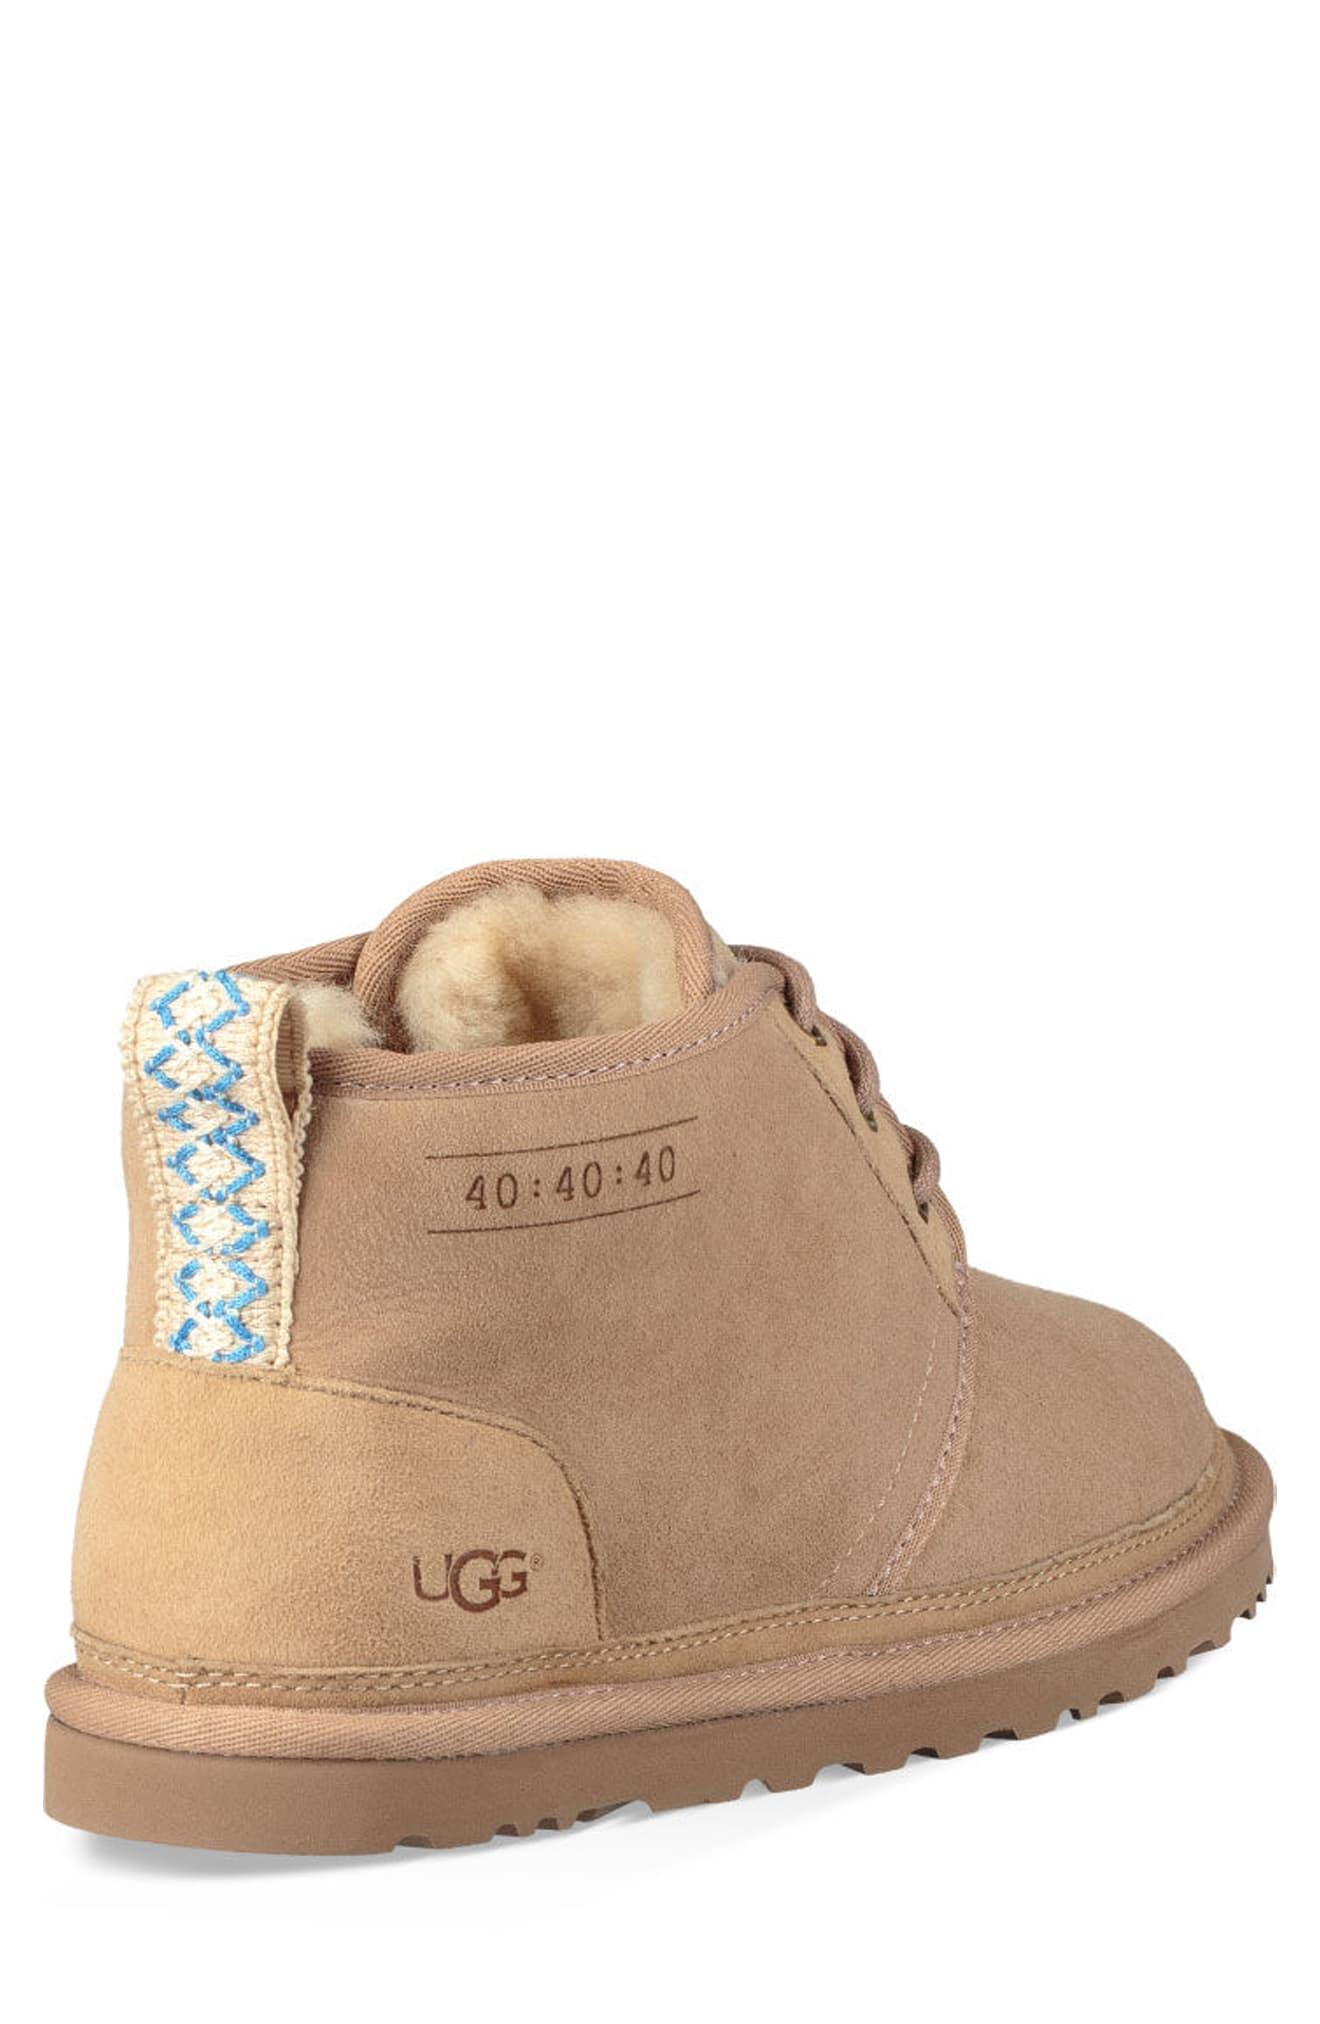 03563055271 Ugg - Natural Ugg Neumel 40:40:40 Anniversary Genuine Shearling Boot for  Men - Lyst